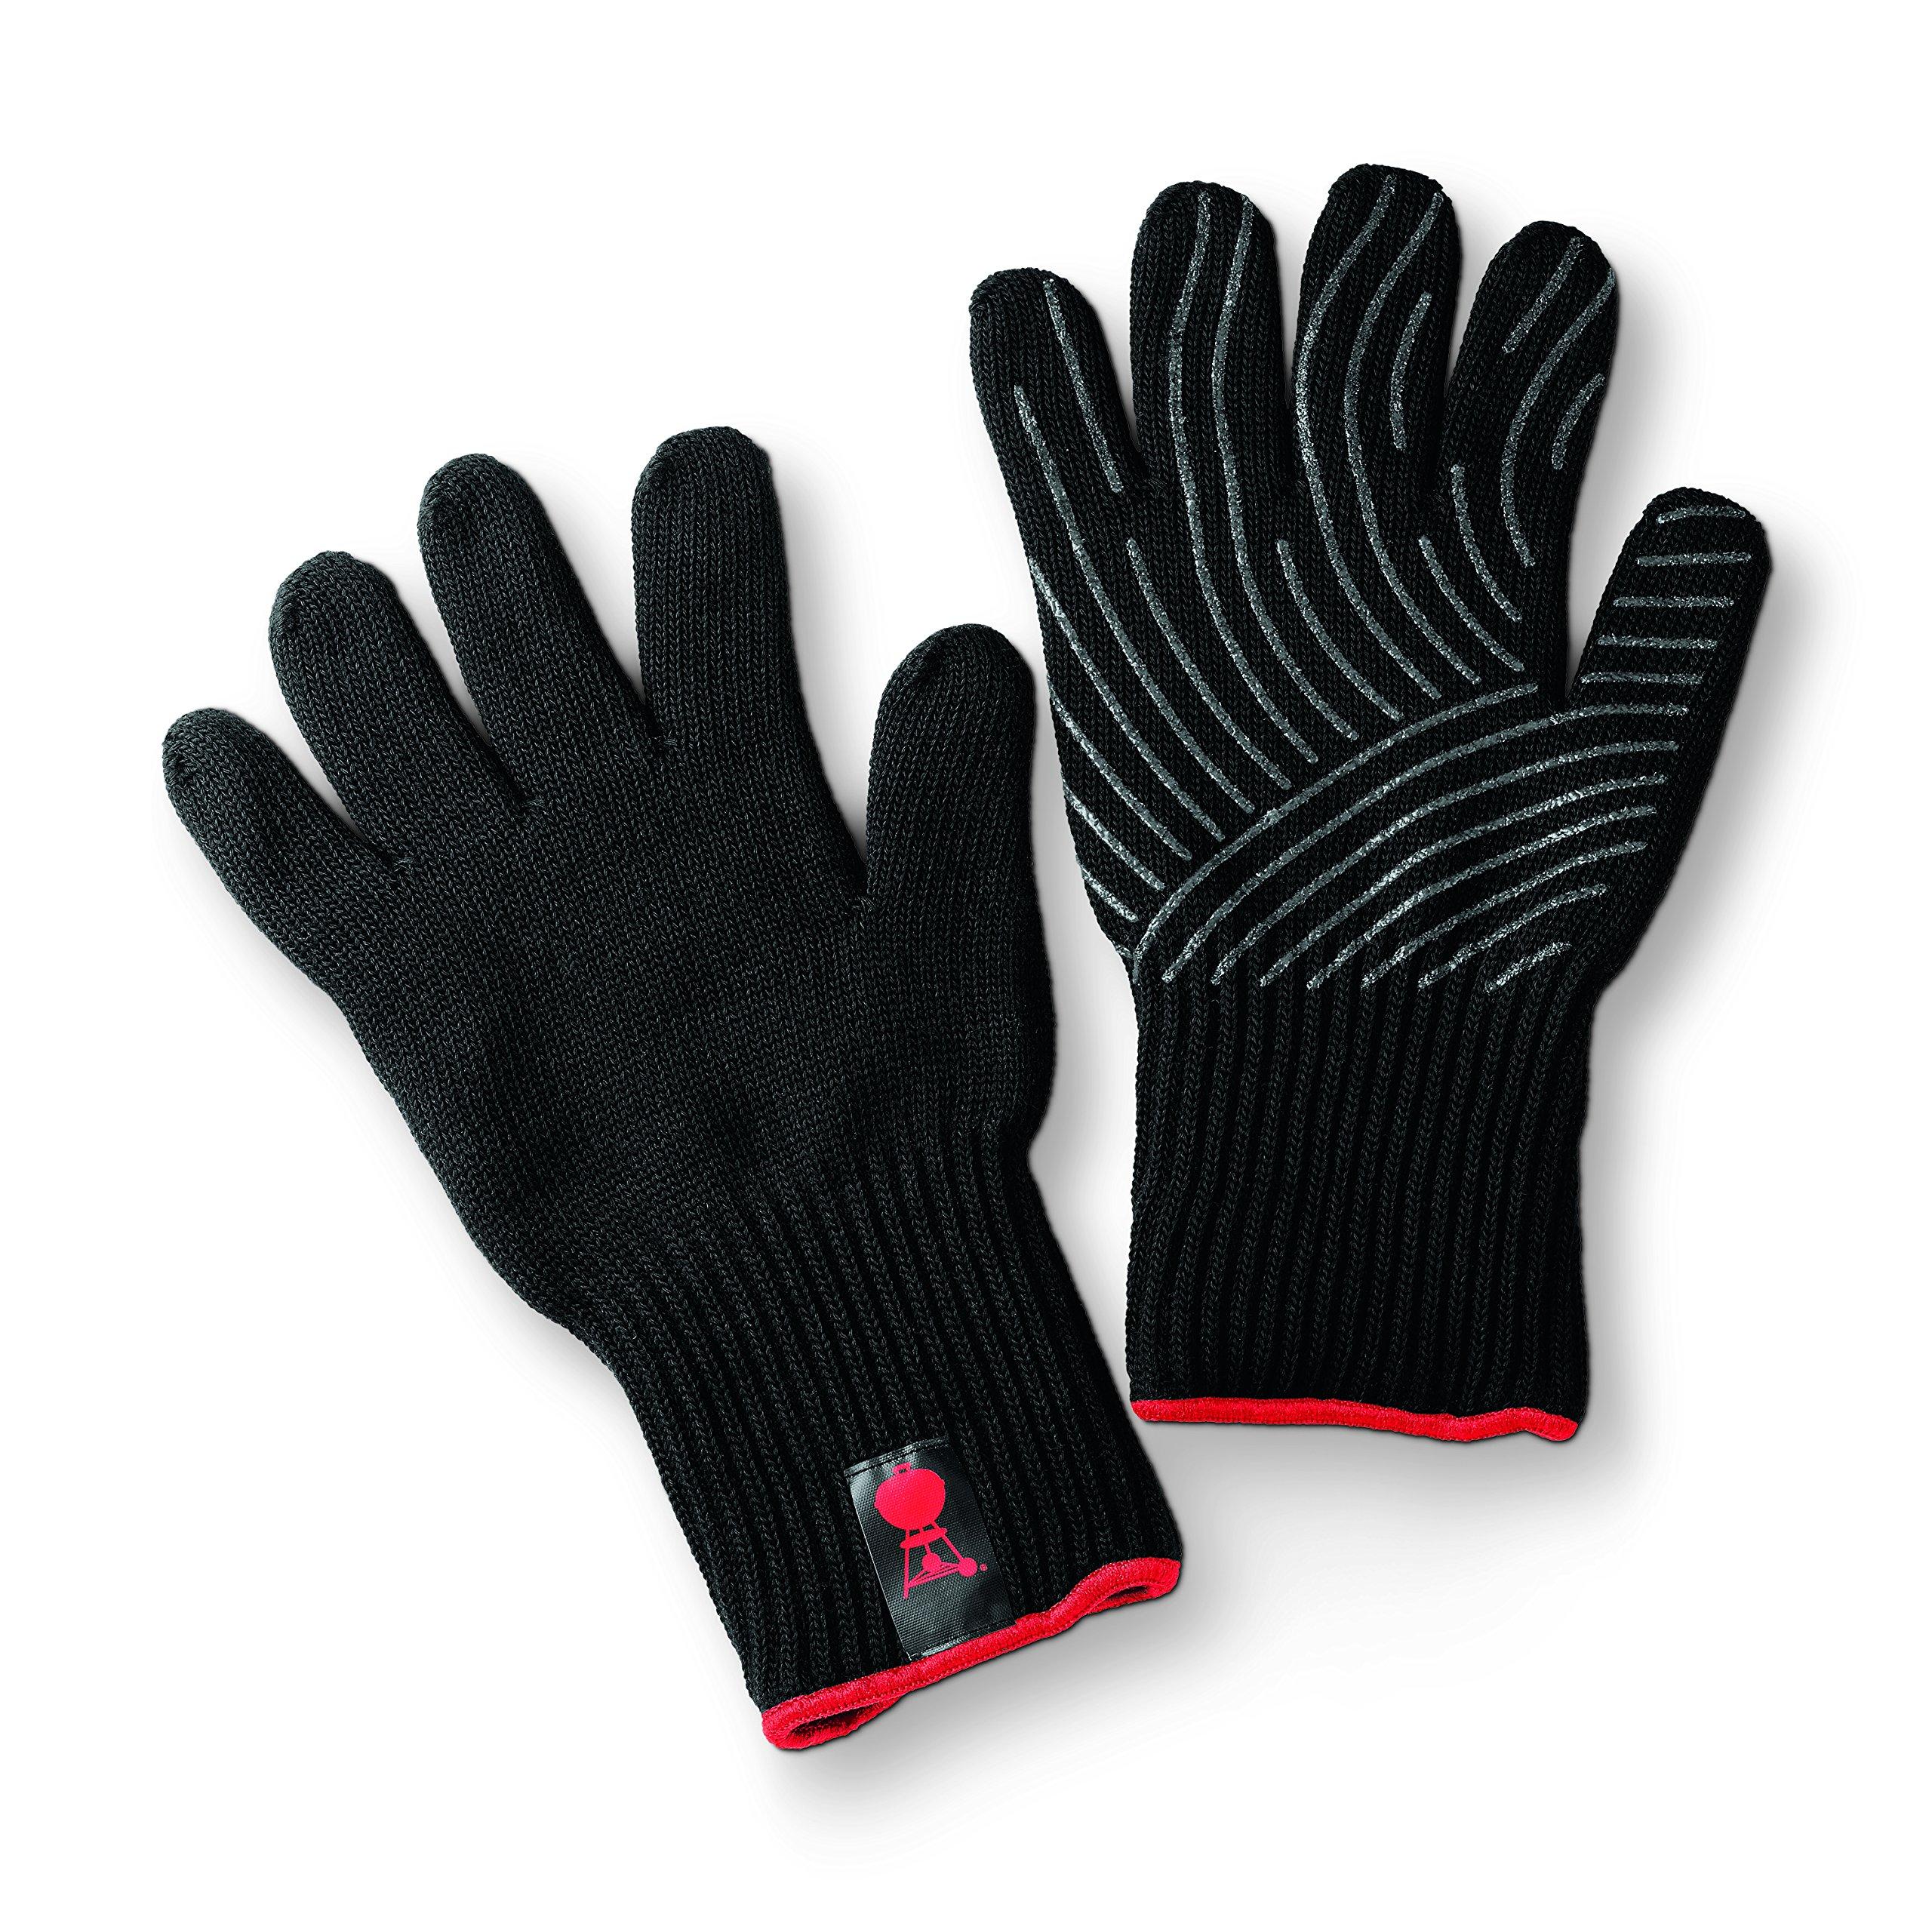 Weber 6670 Large/X-Large Premium Barbeque Glove Set by Weber (Image #3)